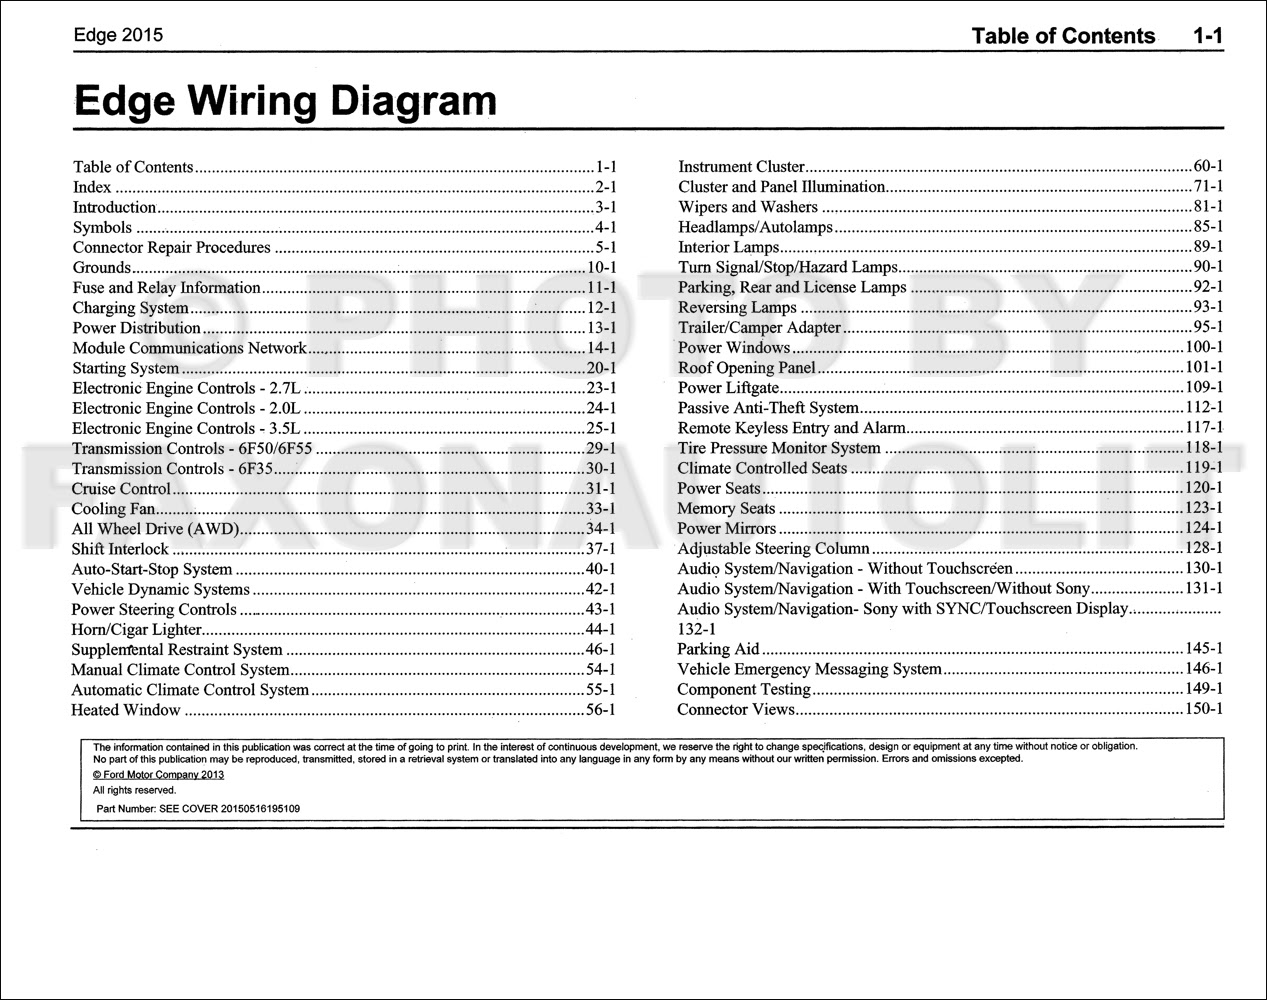 33 Ford Edge Wiring Diagram